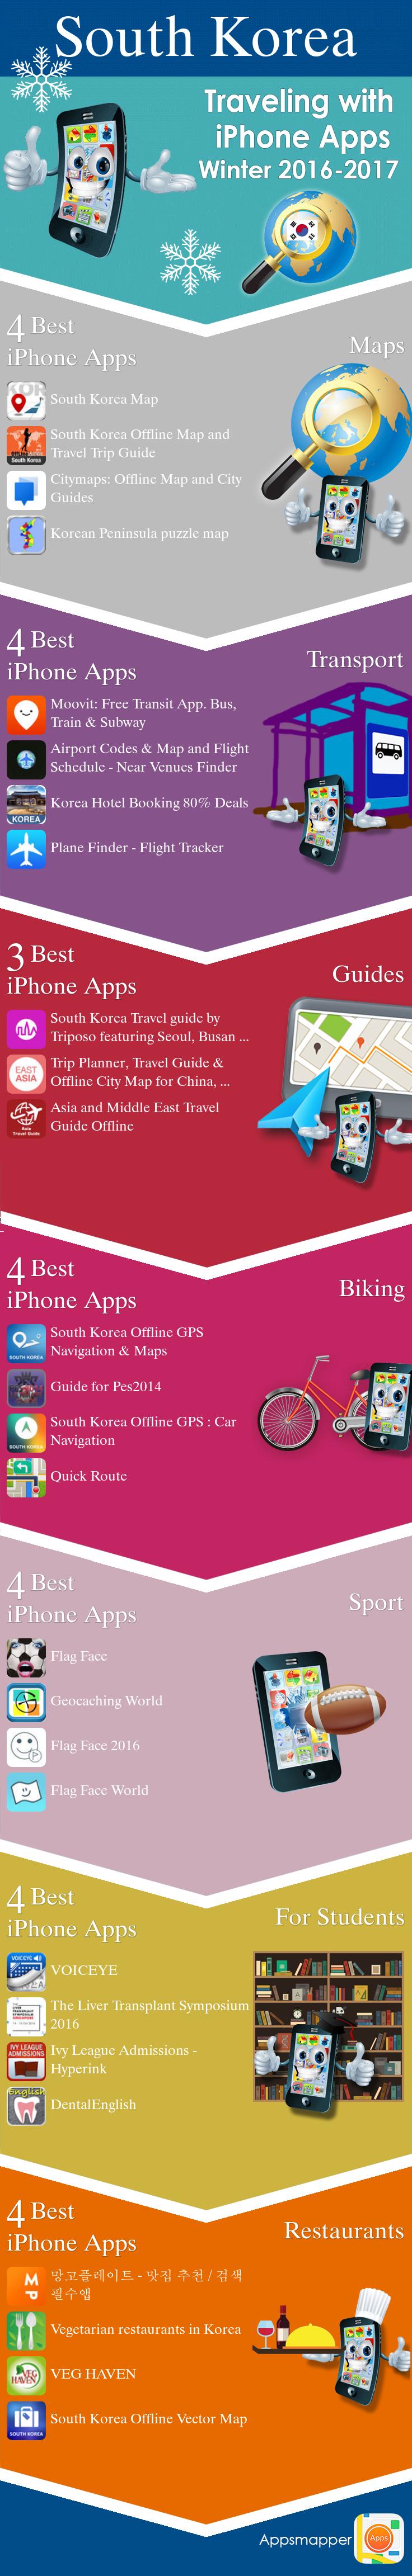 South Korea Iphone Apps App Travel App Iphone Apps